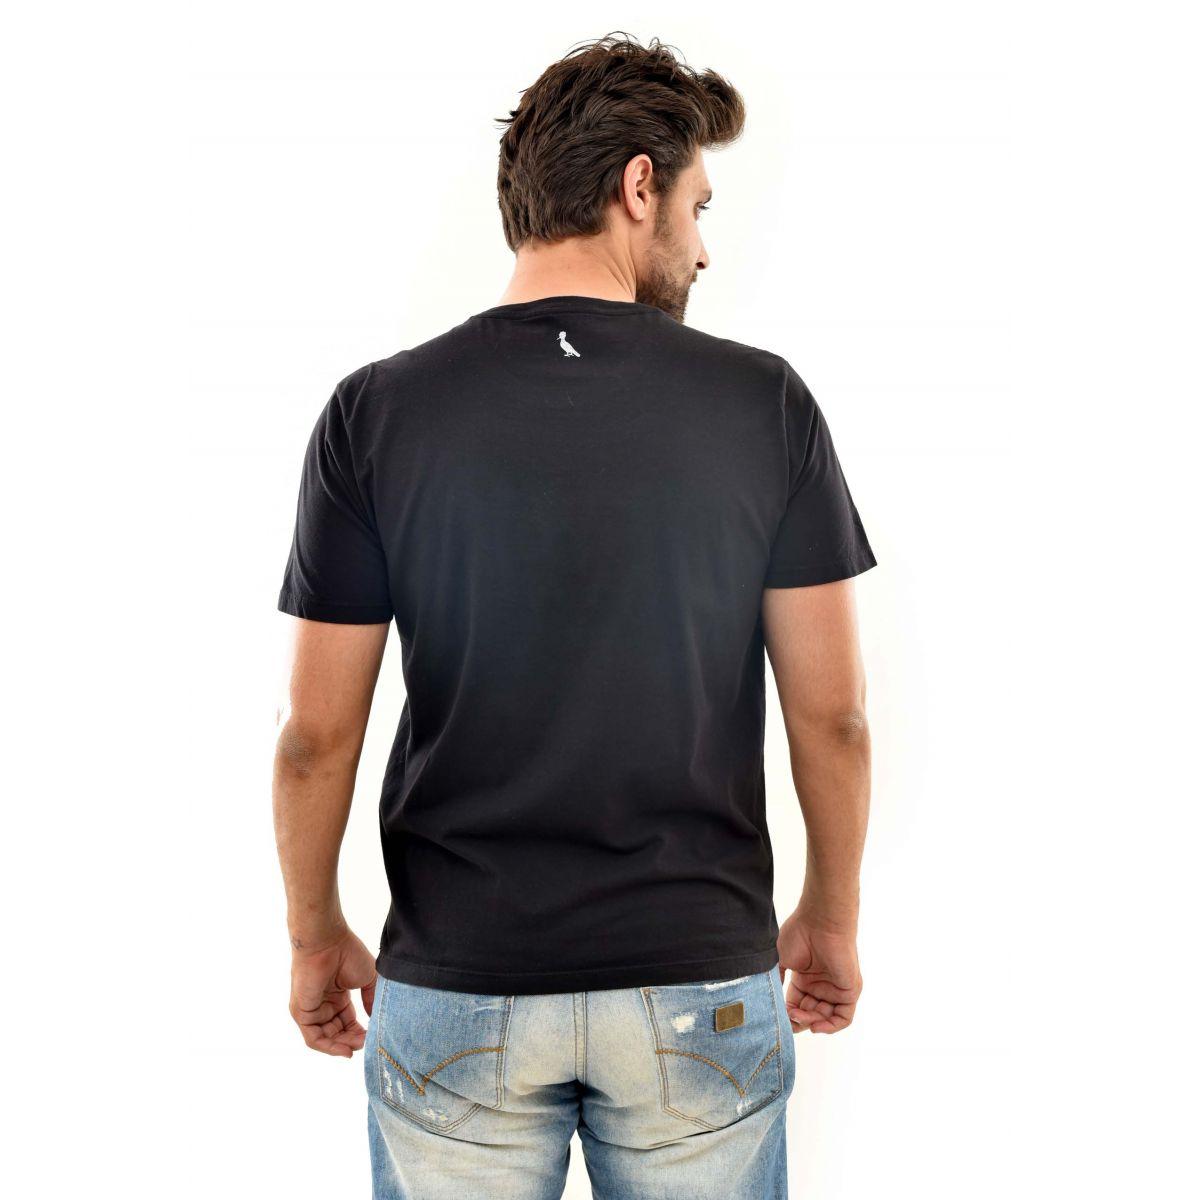 Camiseta Reserva Hindu Preta  - Ca Brasileira